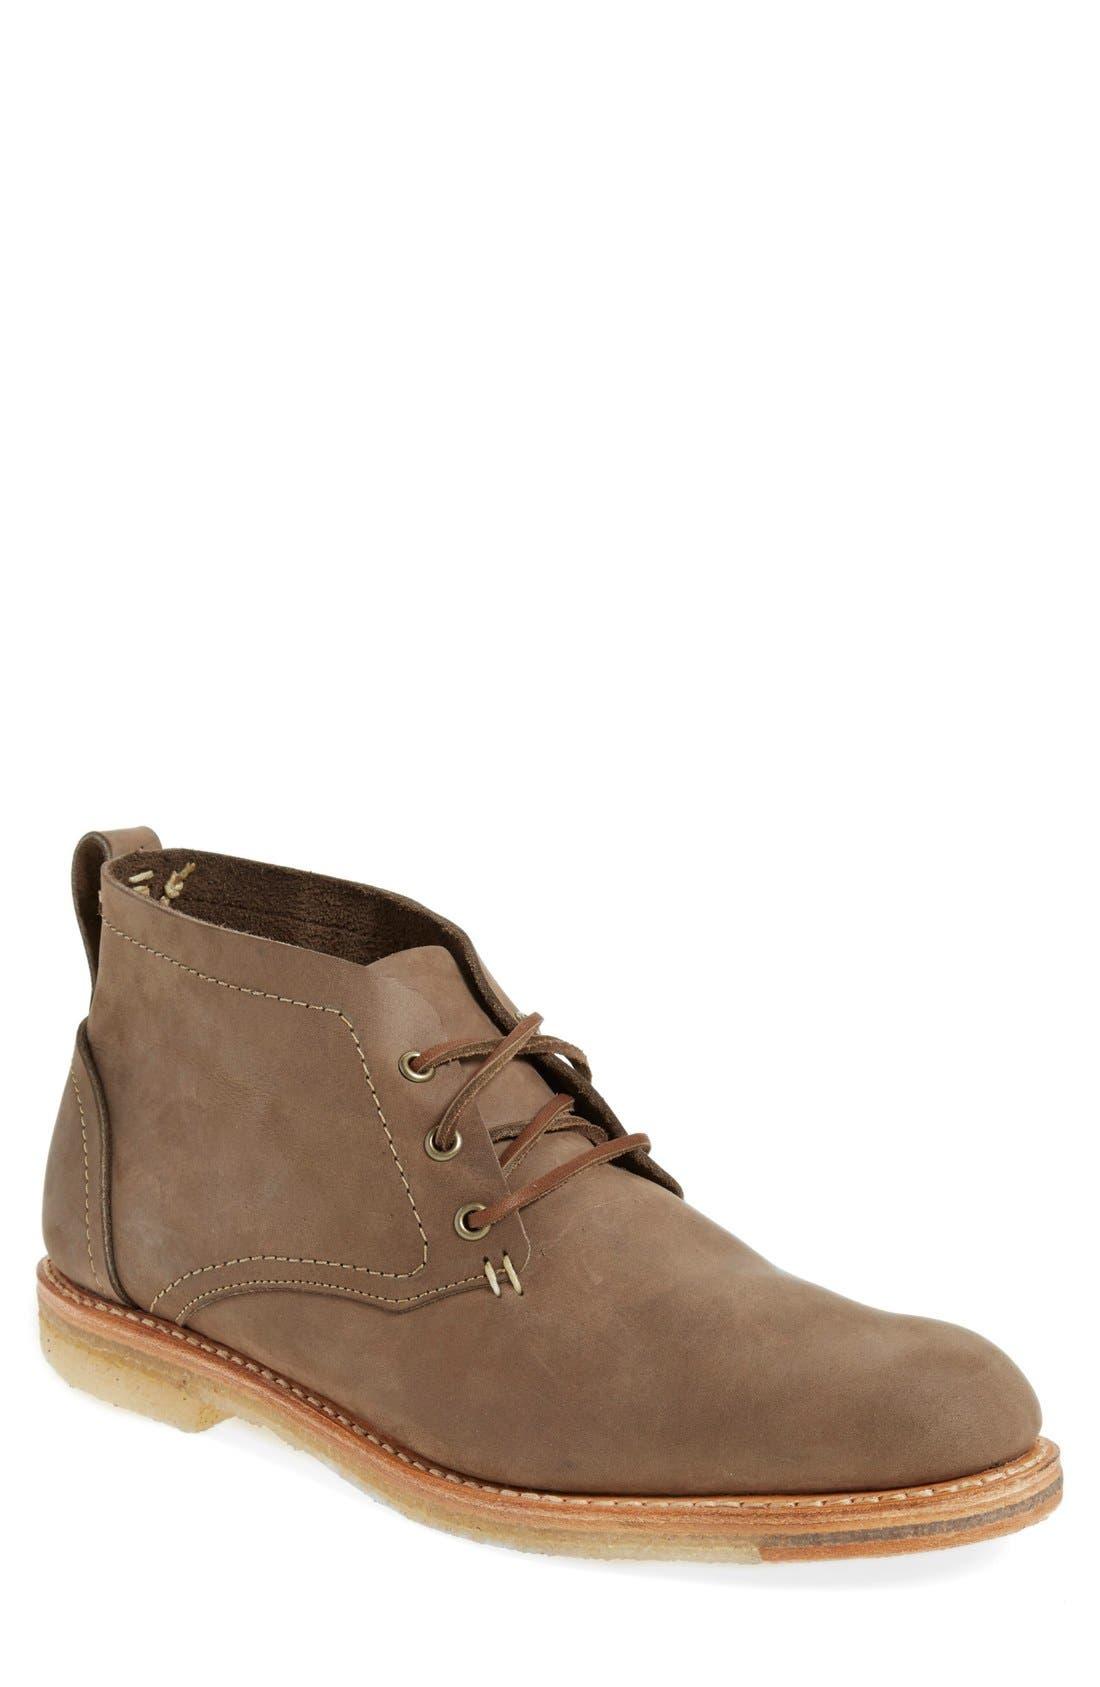 ALLEN EDMONDS 'Leawood' Chukka Boot, Main, color, 200